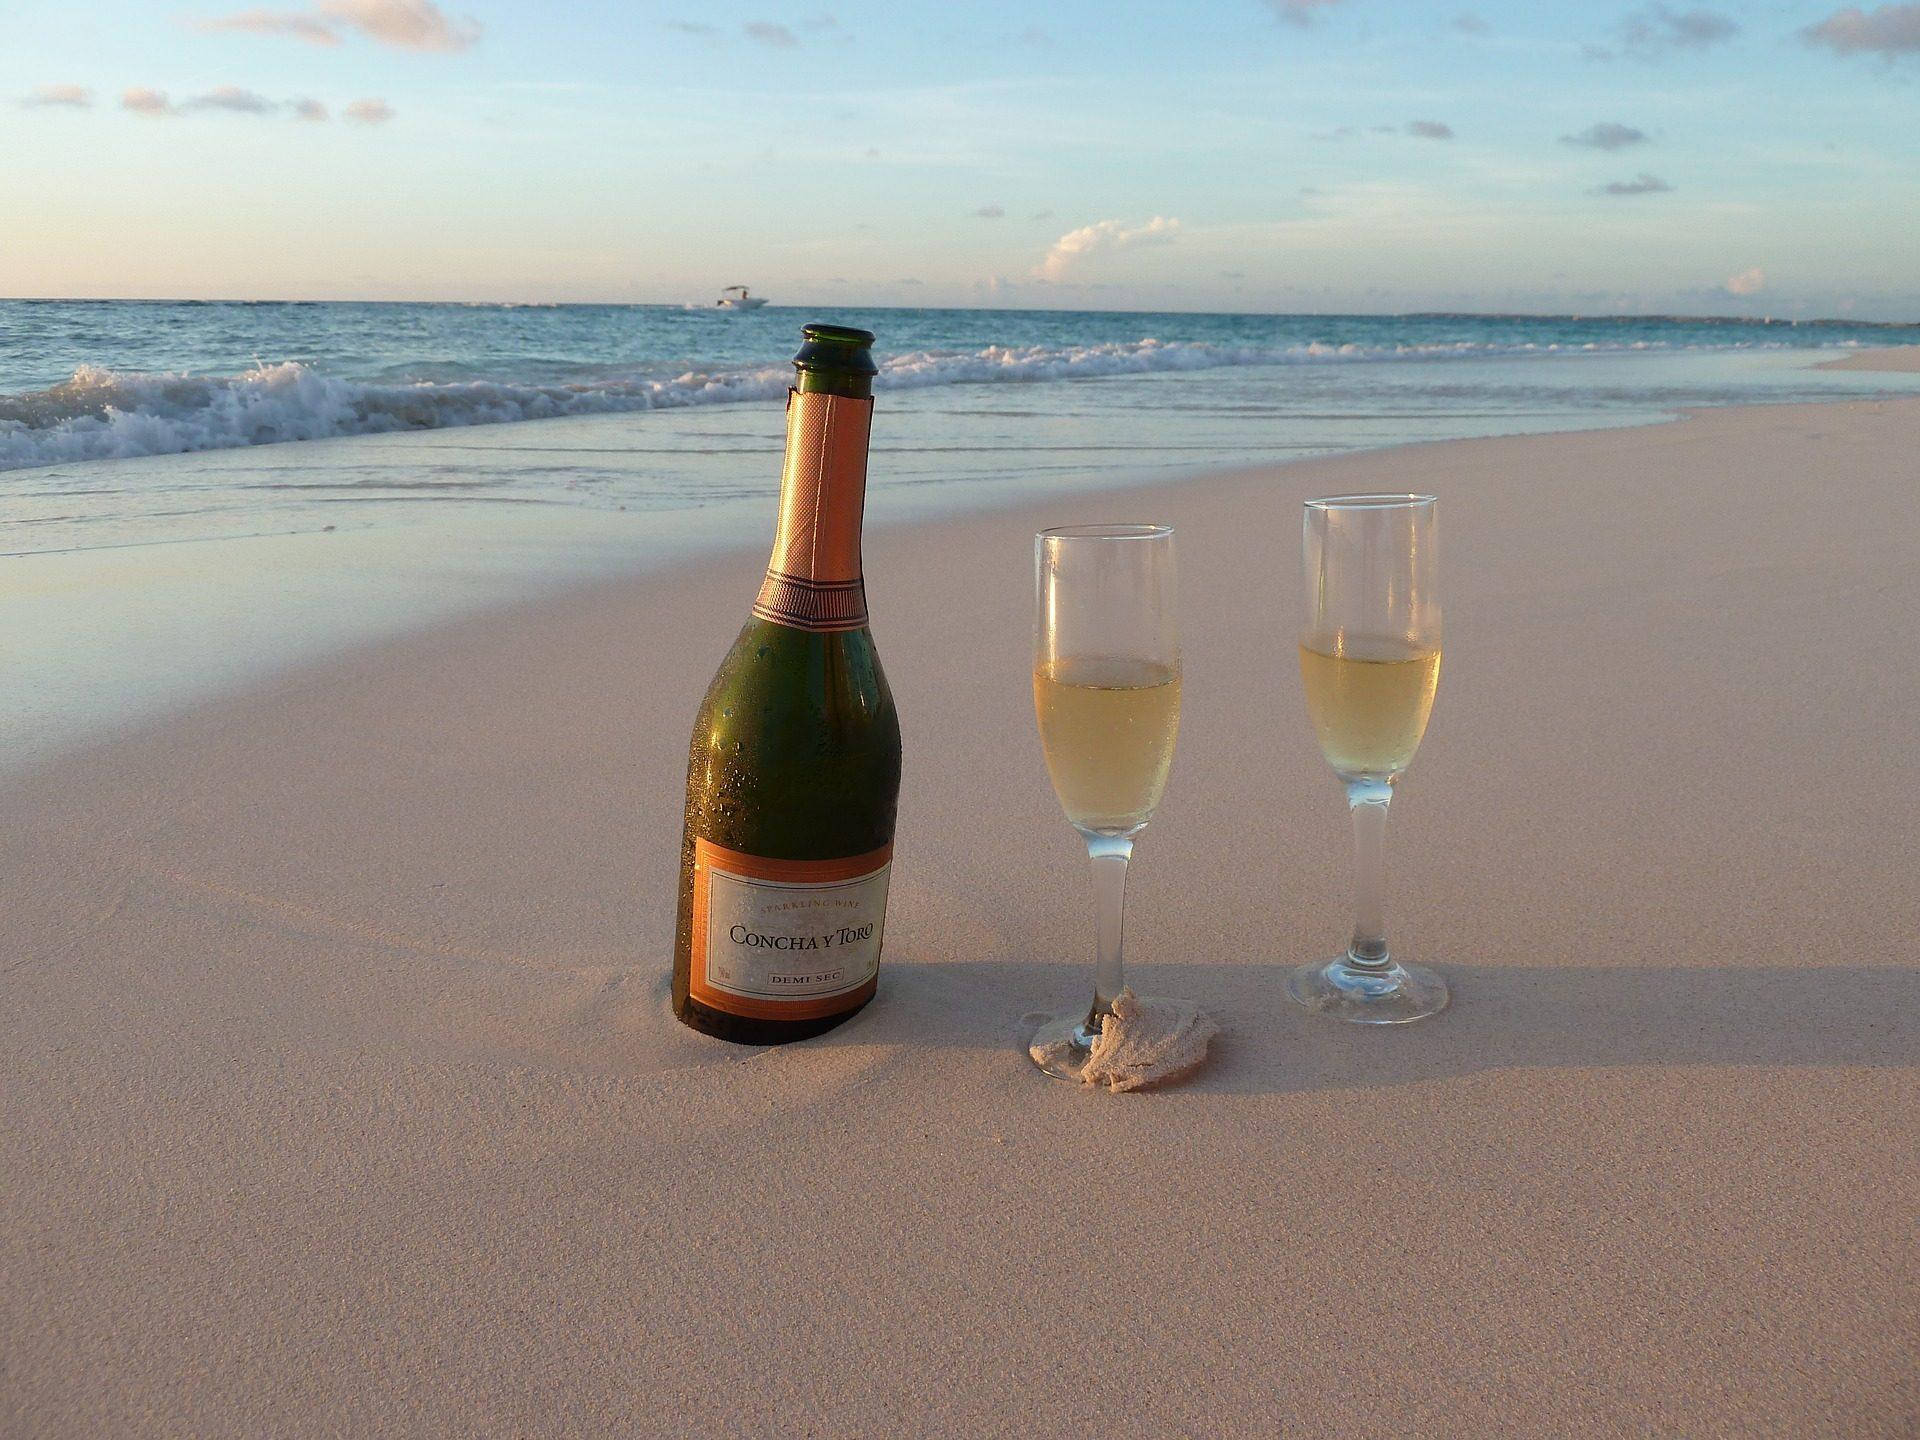 Champagner, Tassen, Sand, Strand, Meer, romantische - Wallpaper HD - Prof.-falken.com